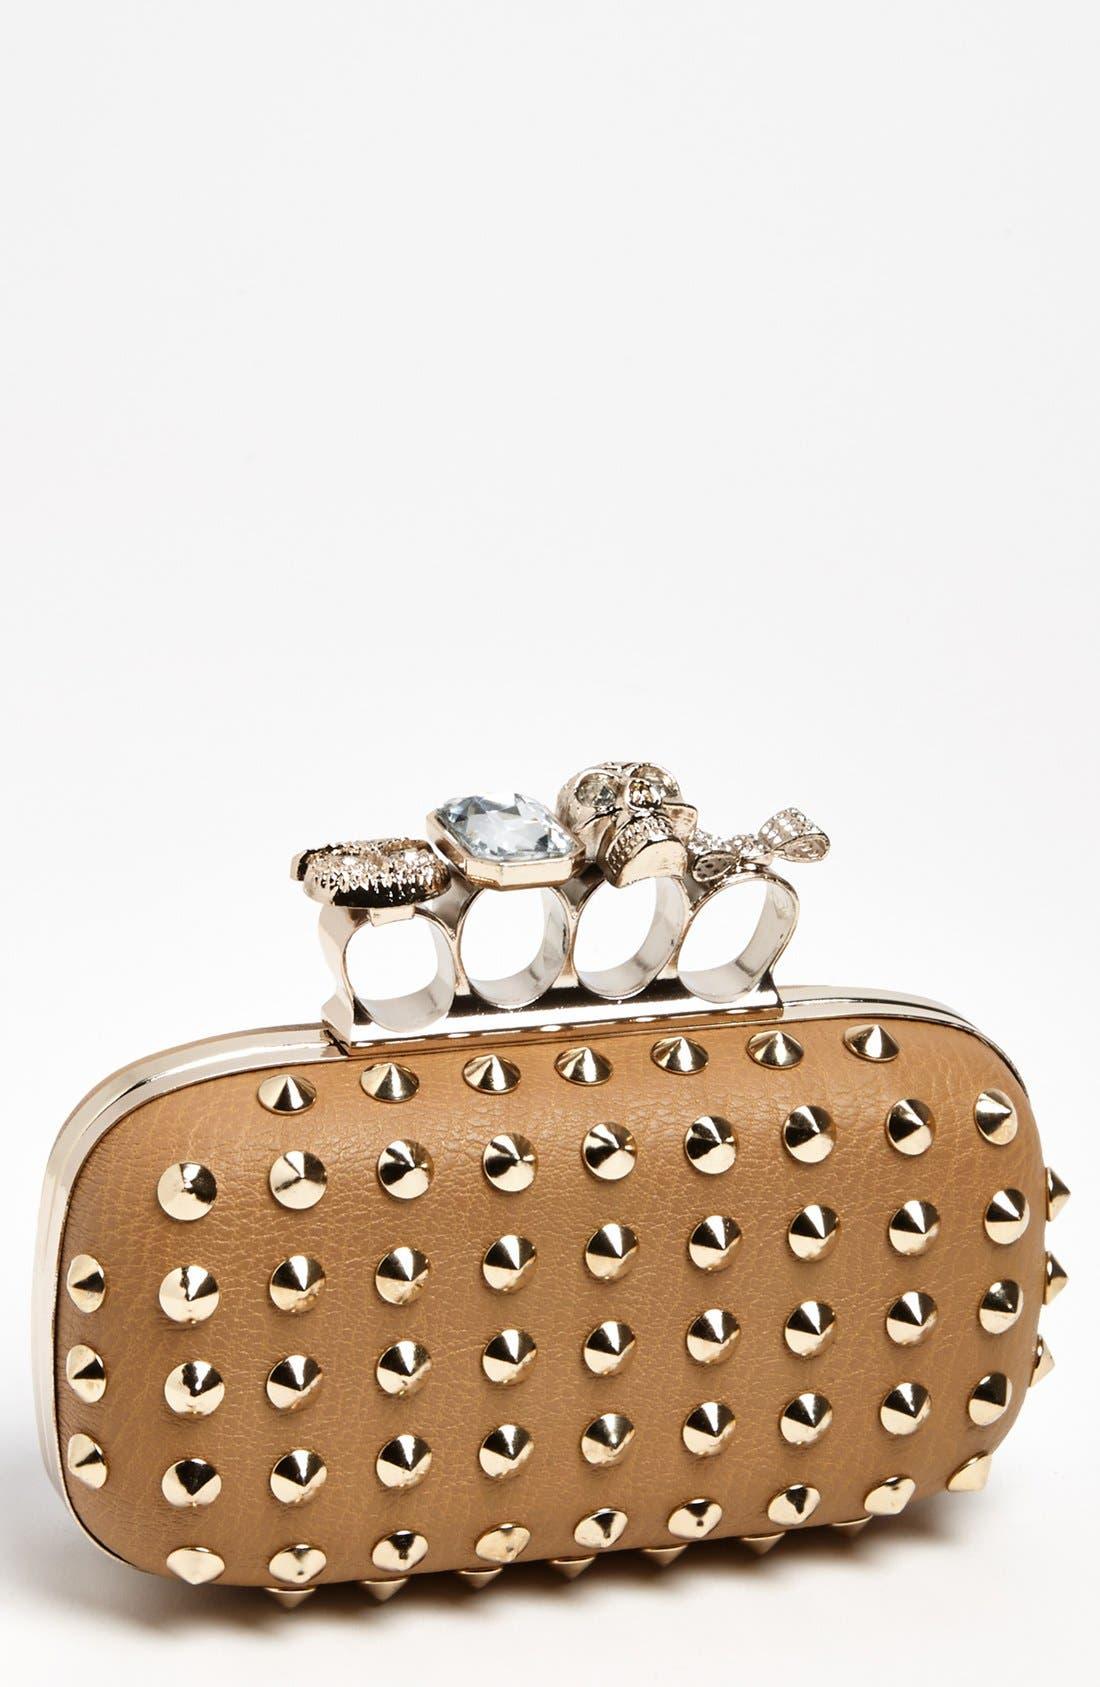 Main Image - Natasha Couture 'Finger' Studded Clutch